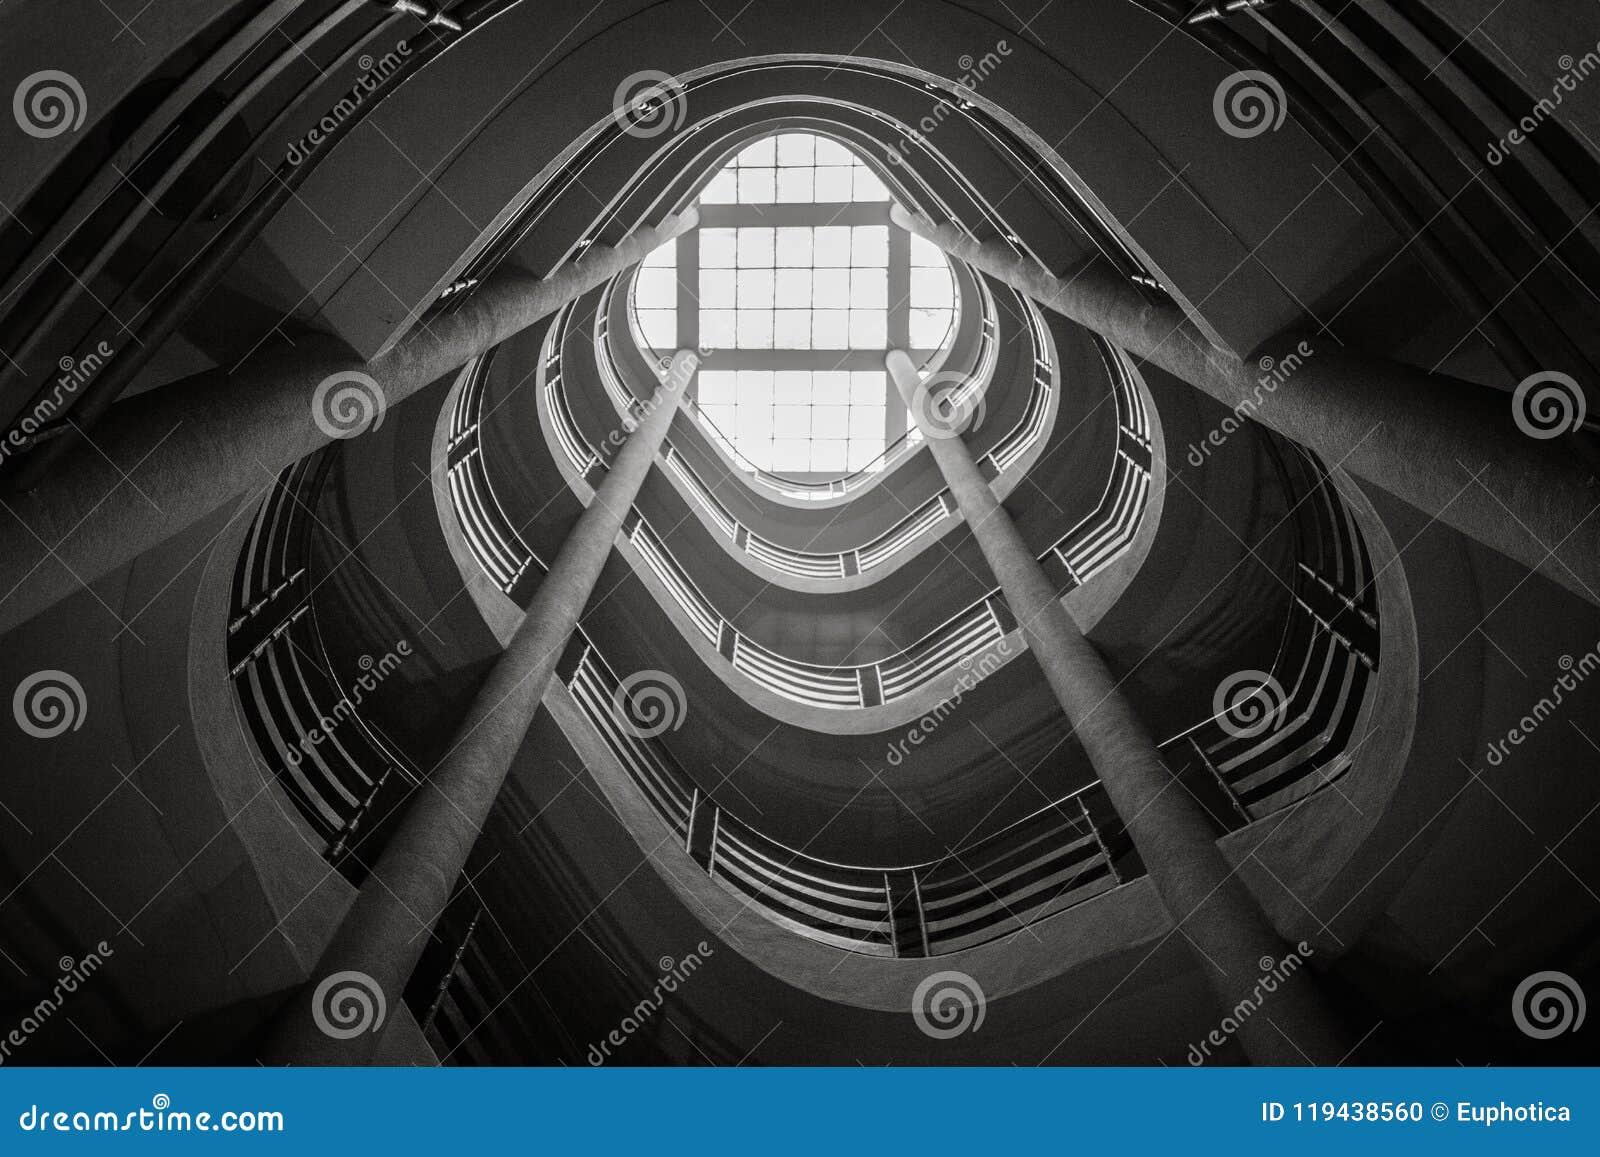 Spiral staircase climbing upward, black and white